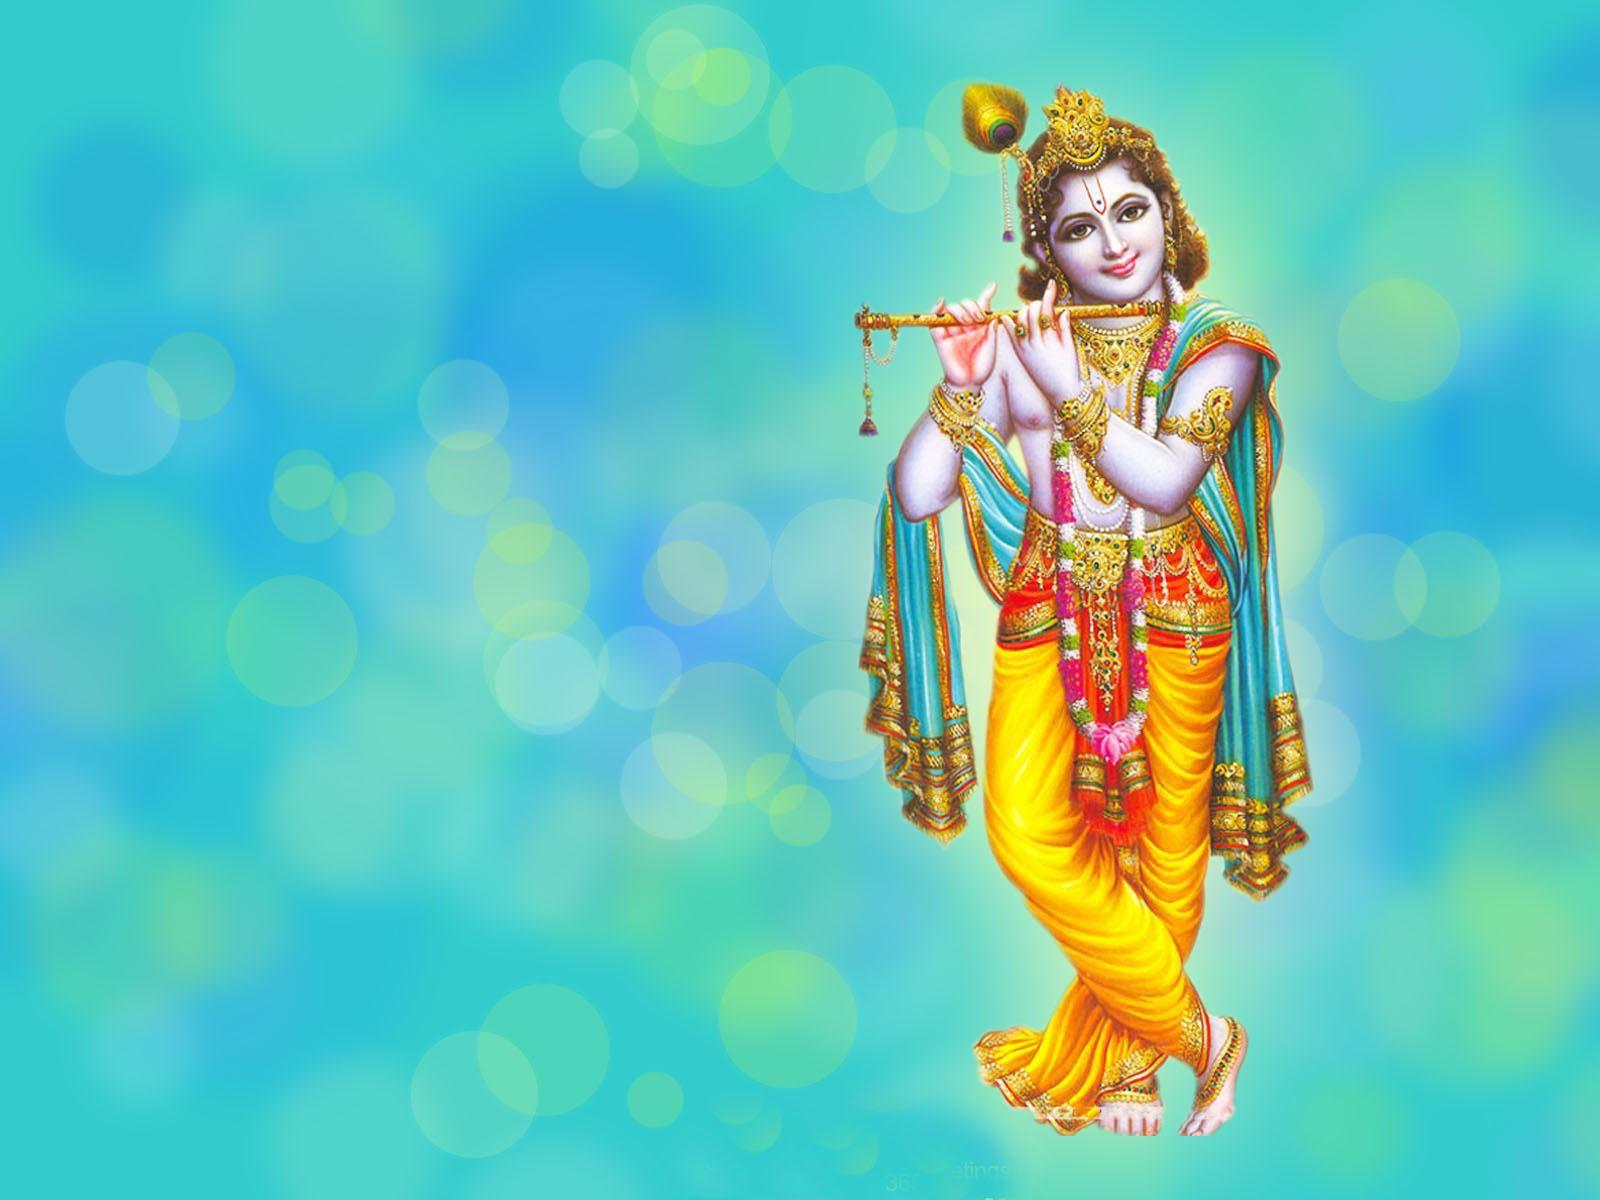 Shree Krishna Wallpapers Hd Wallpaper Cave